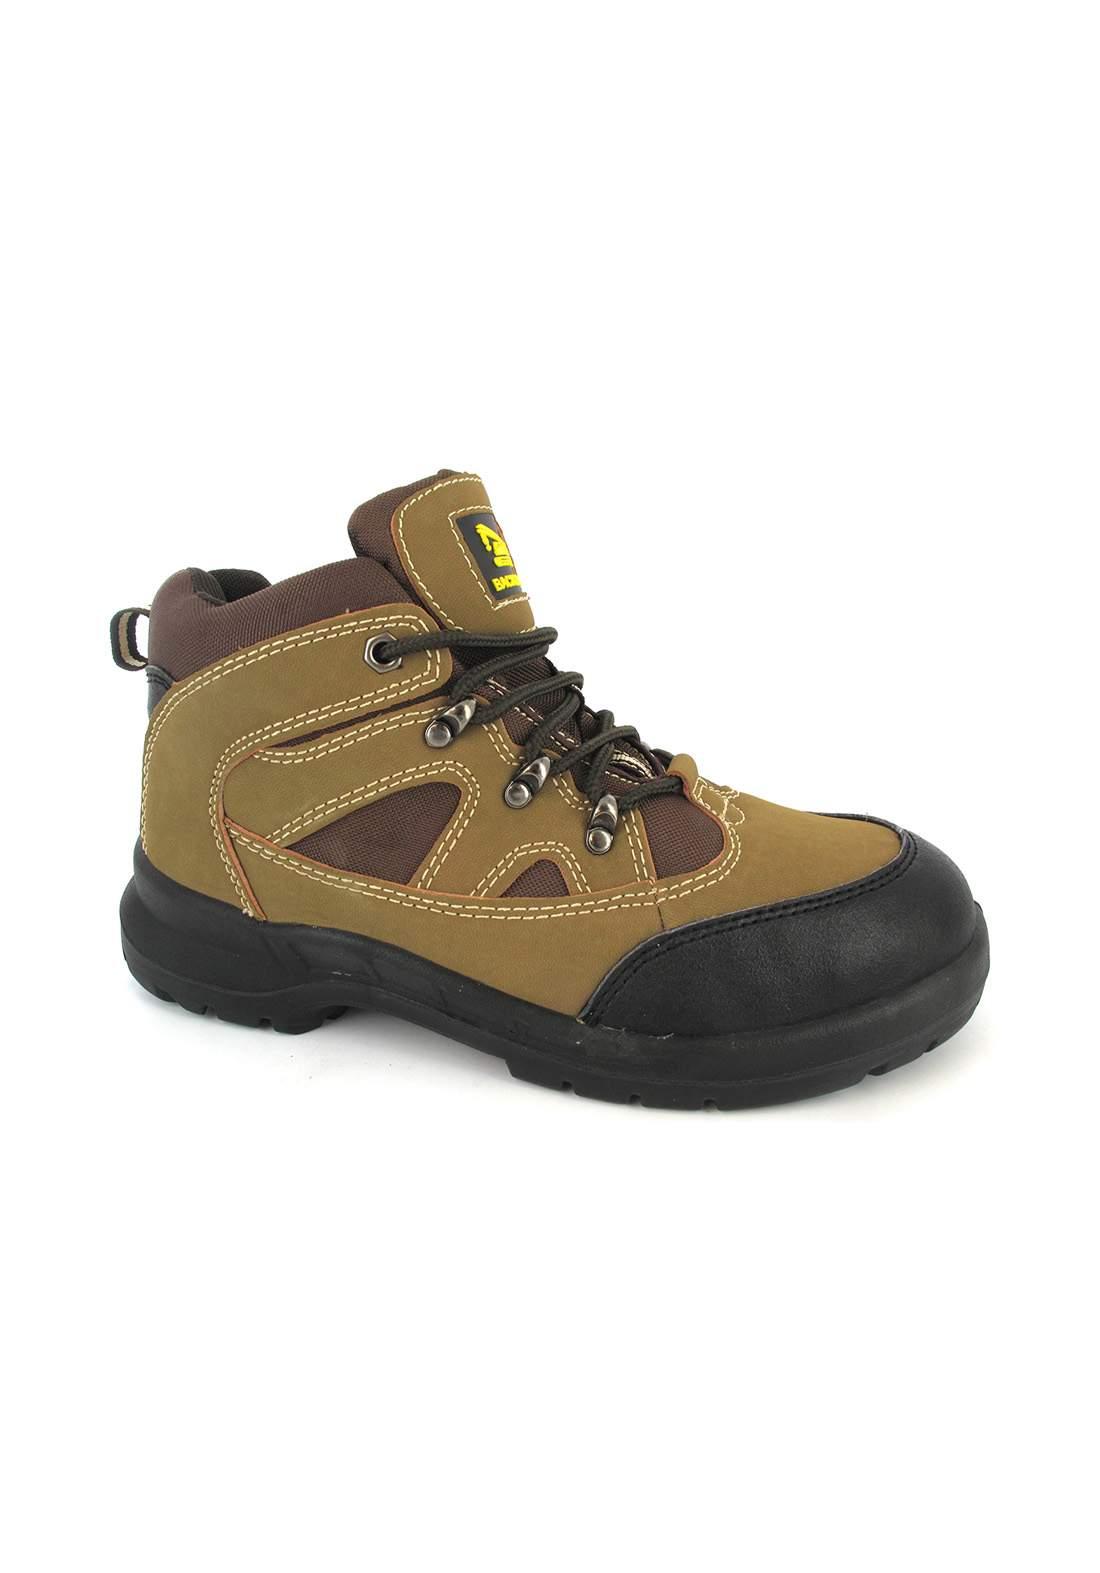 Subul AlHurra Safety Shoes حذاء امان